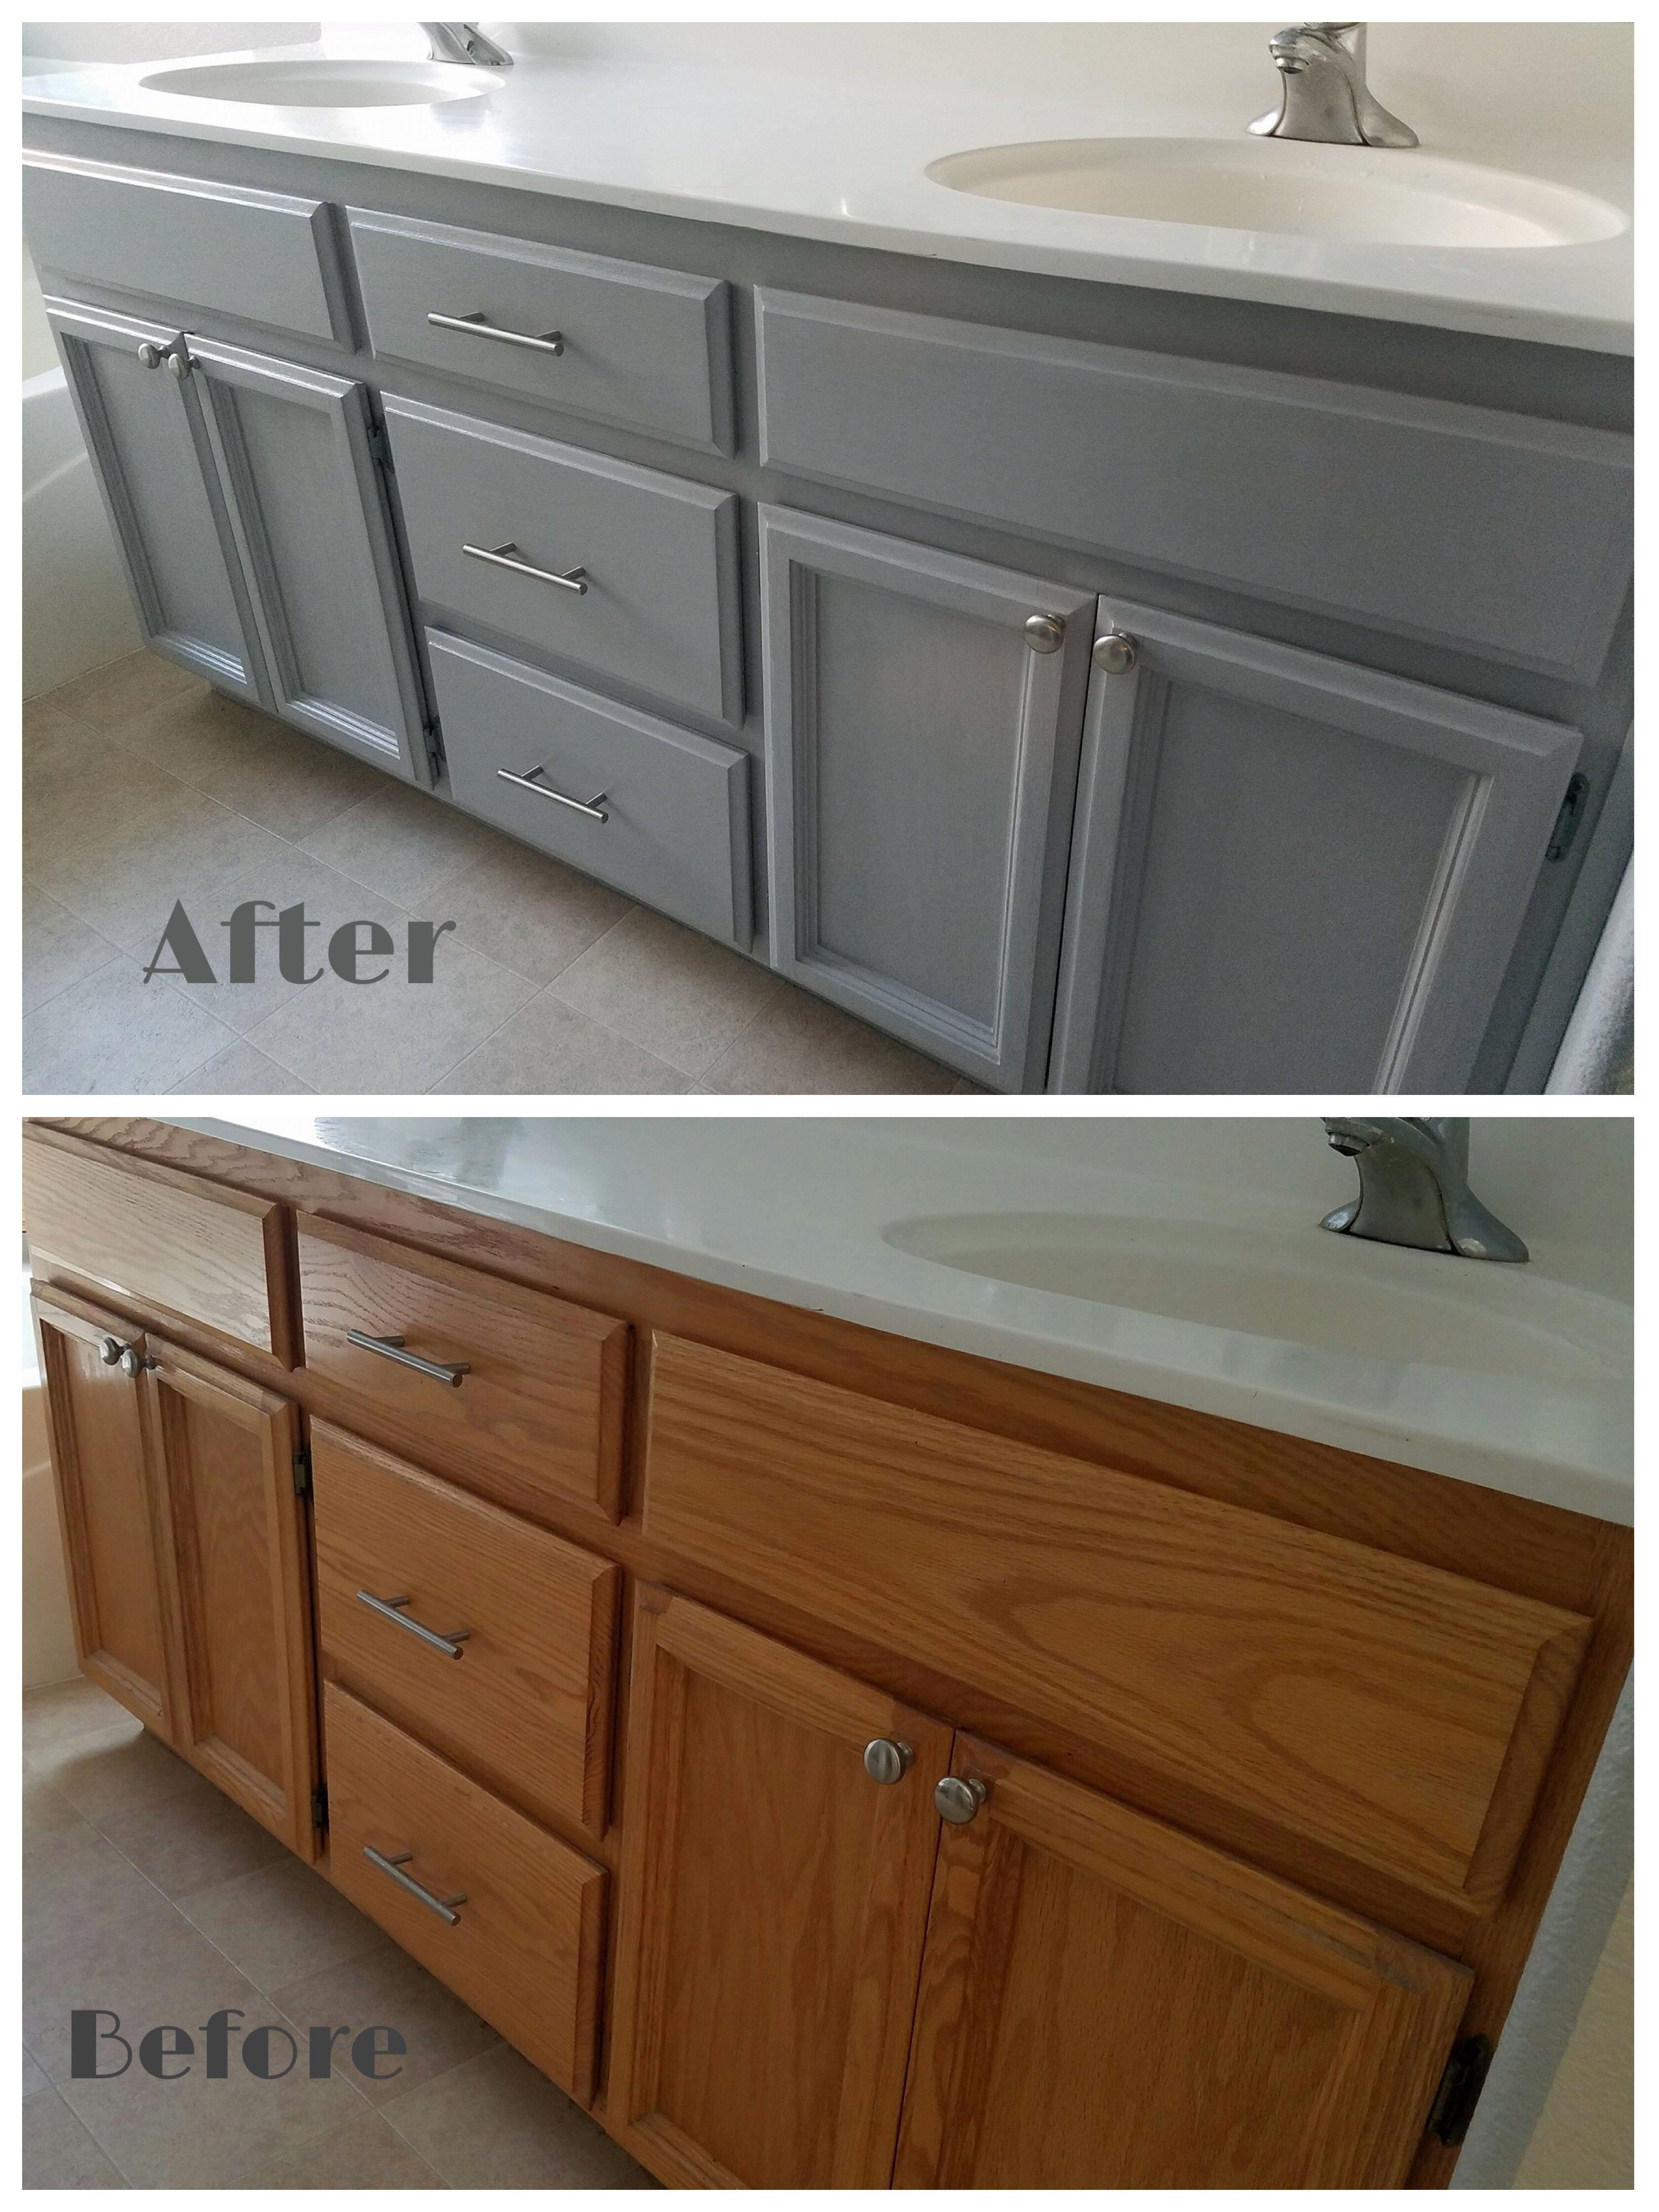 Painted Bathroom Vanity Badezimmerschranke Grau Bad Gunstig Renovieren Tolle Badezimmer